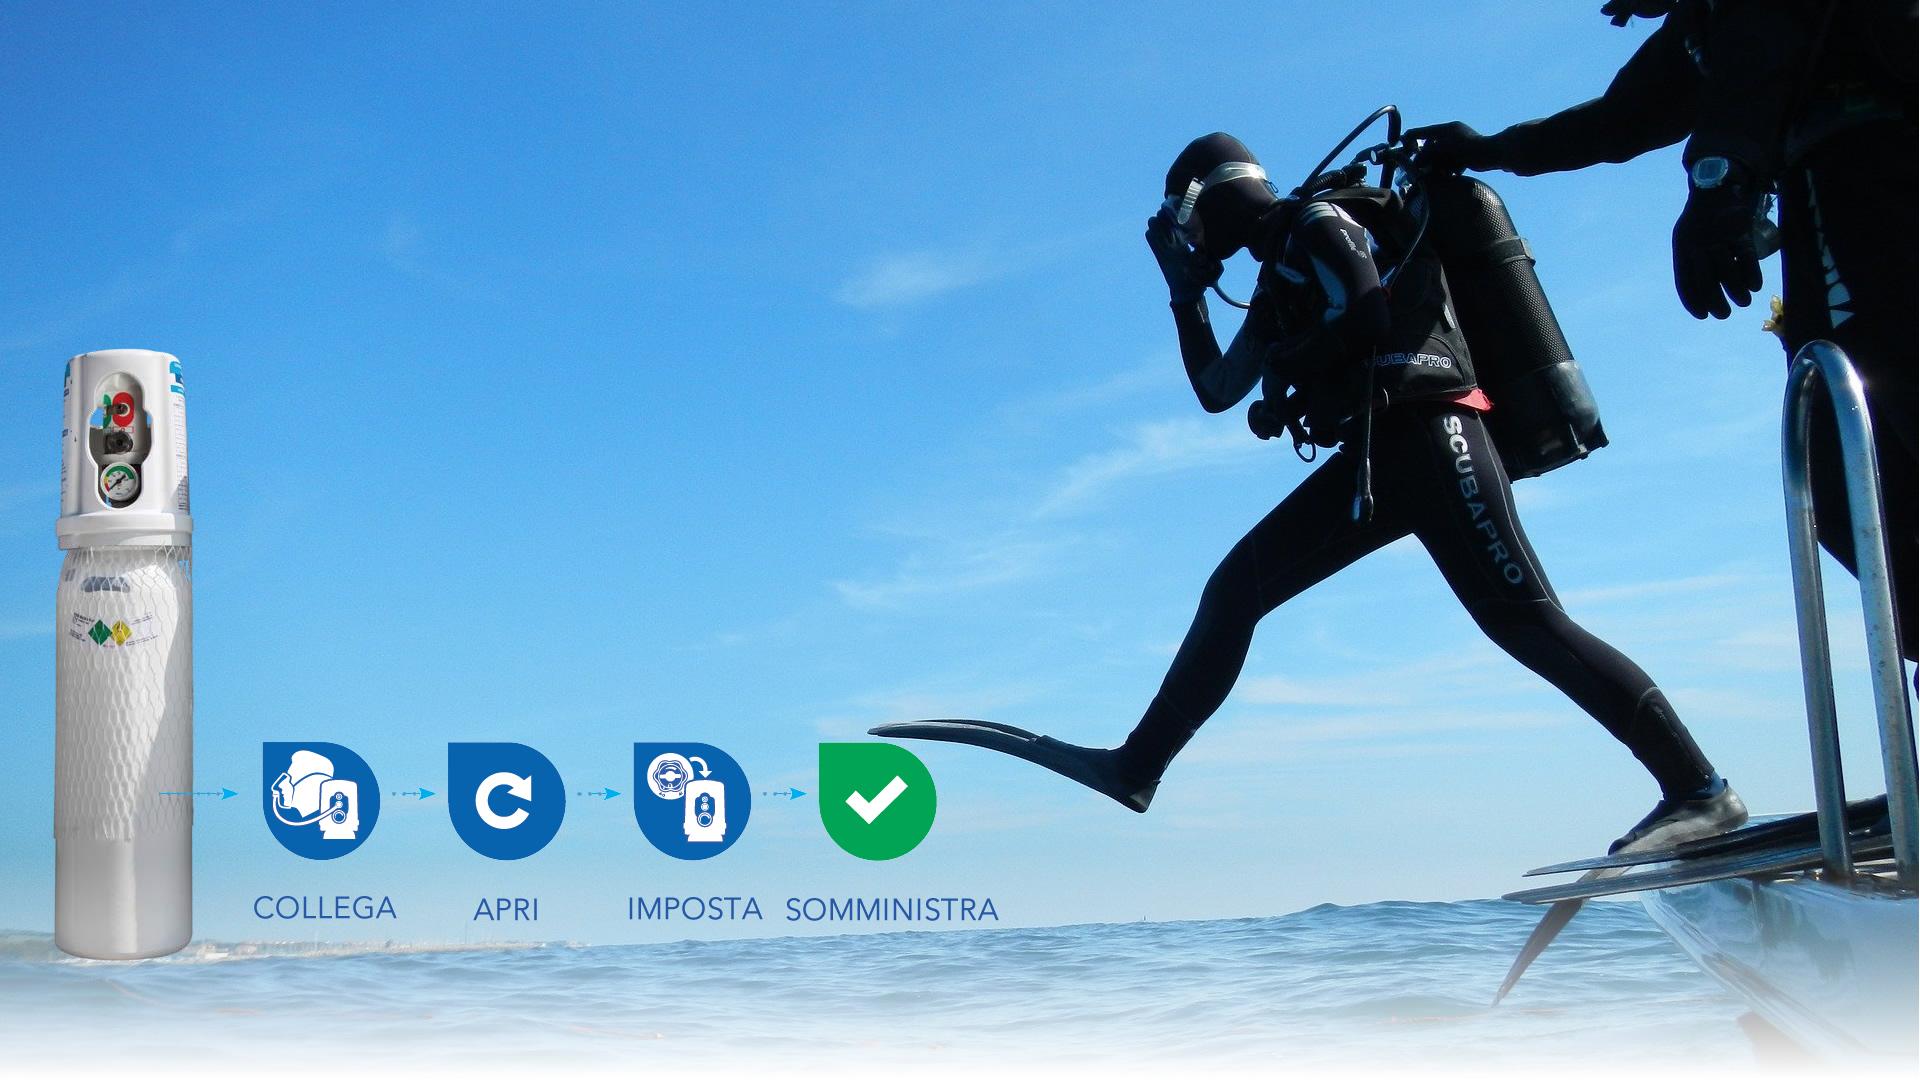 Bombole ossigeno - Diving